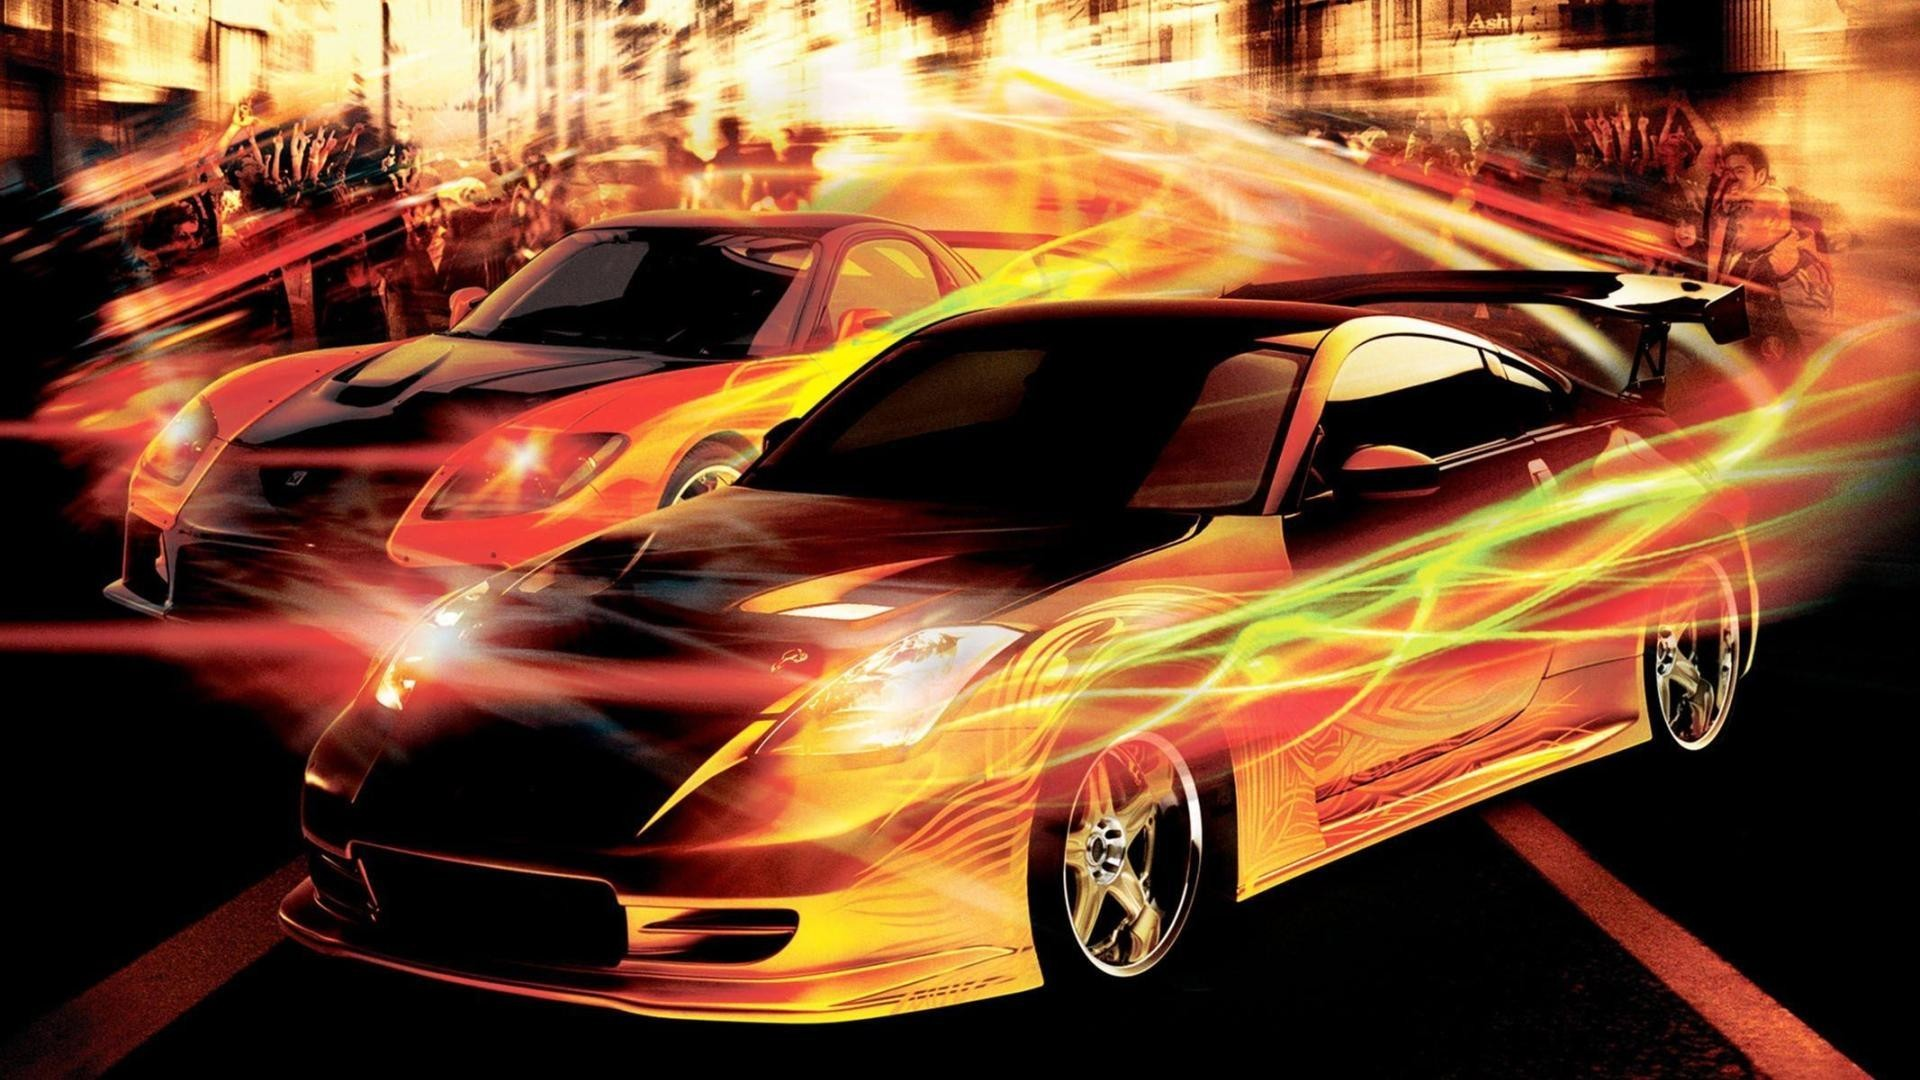 Free desktop wallpaper downloads the fast and the furious tokyo drift.